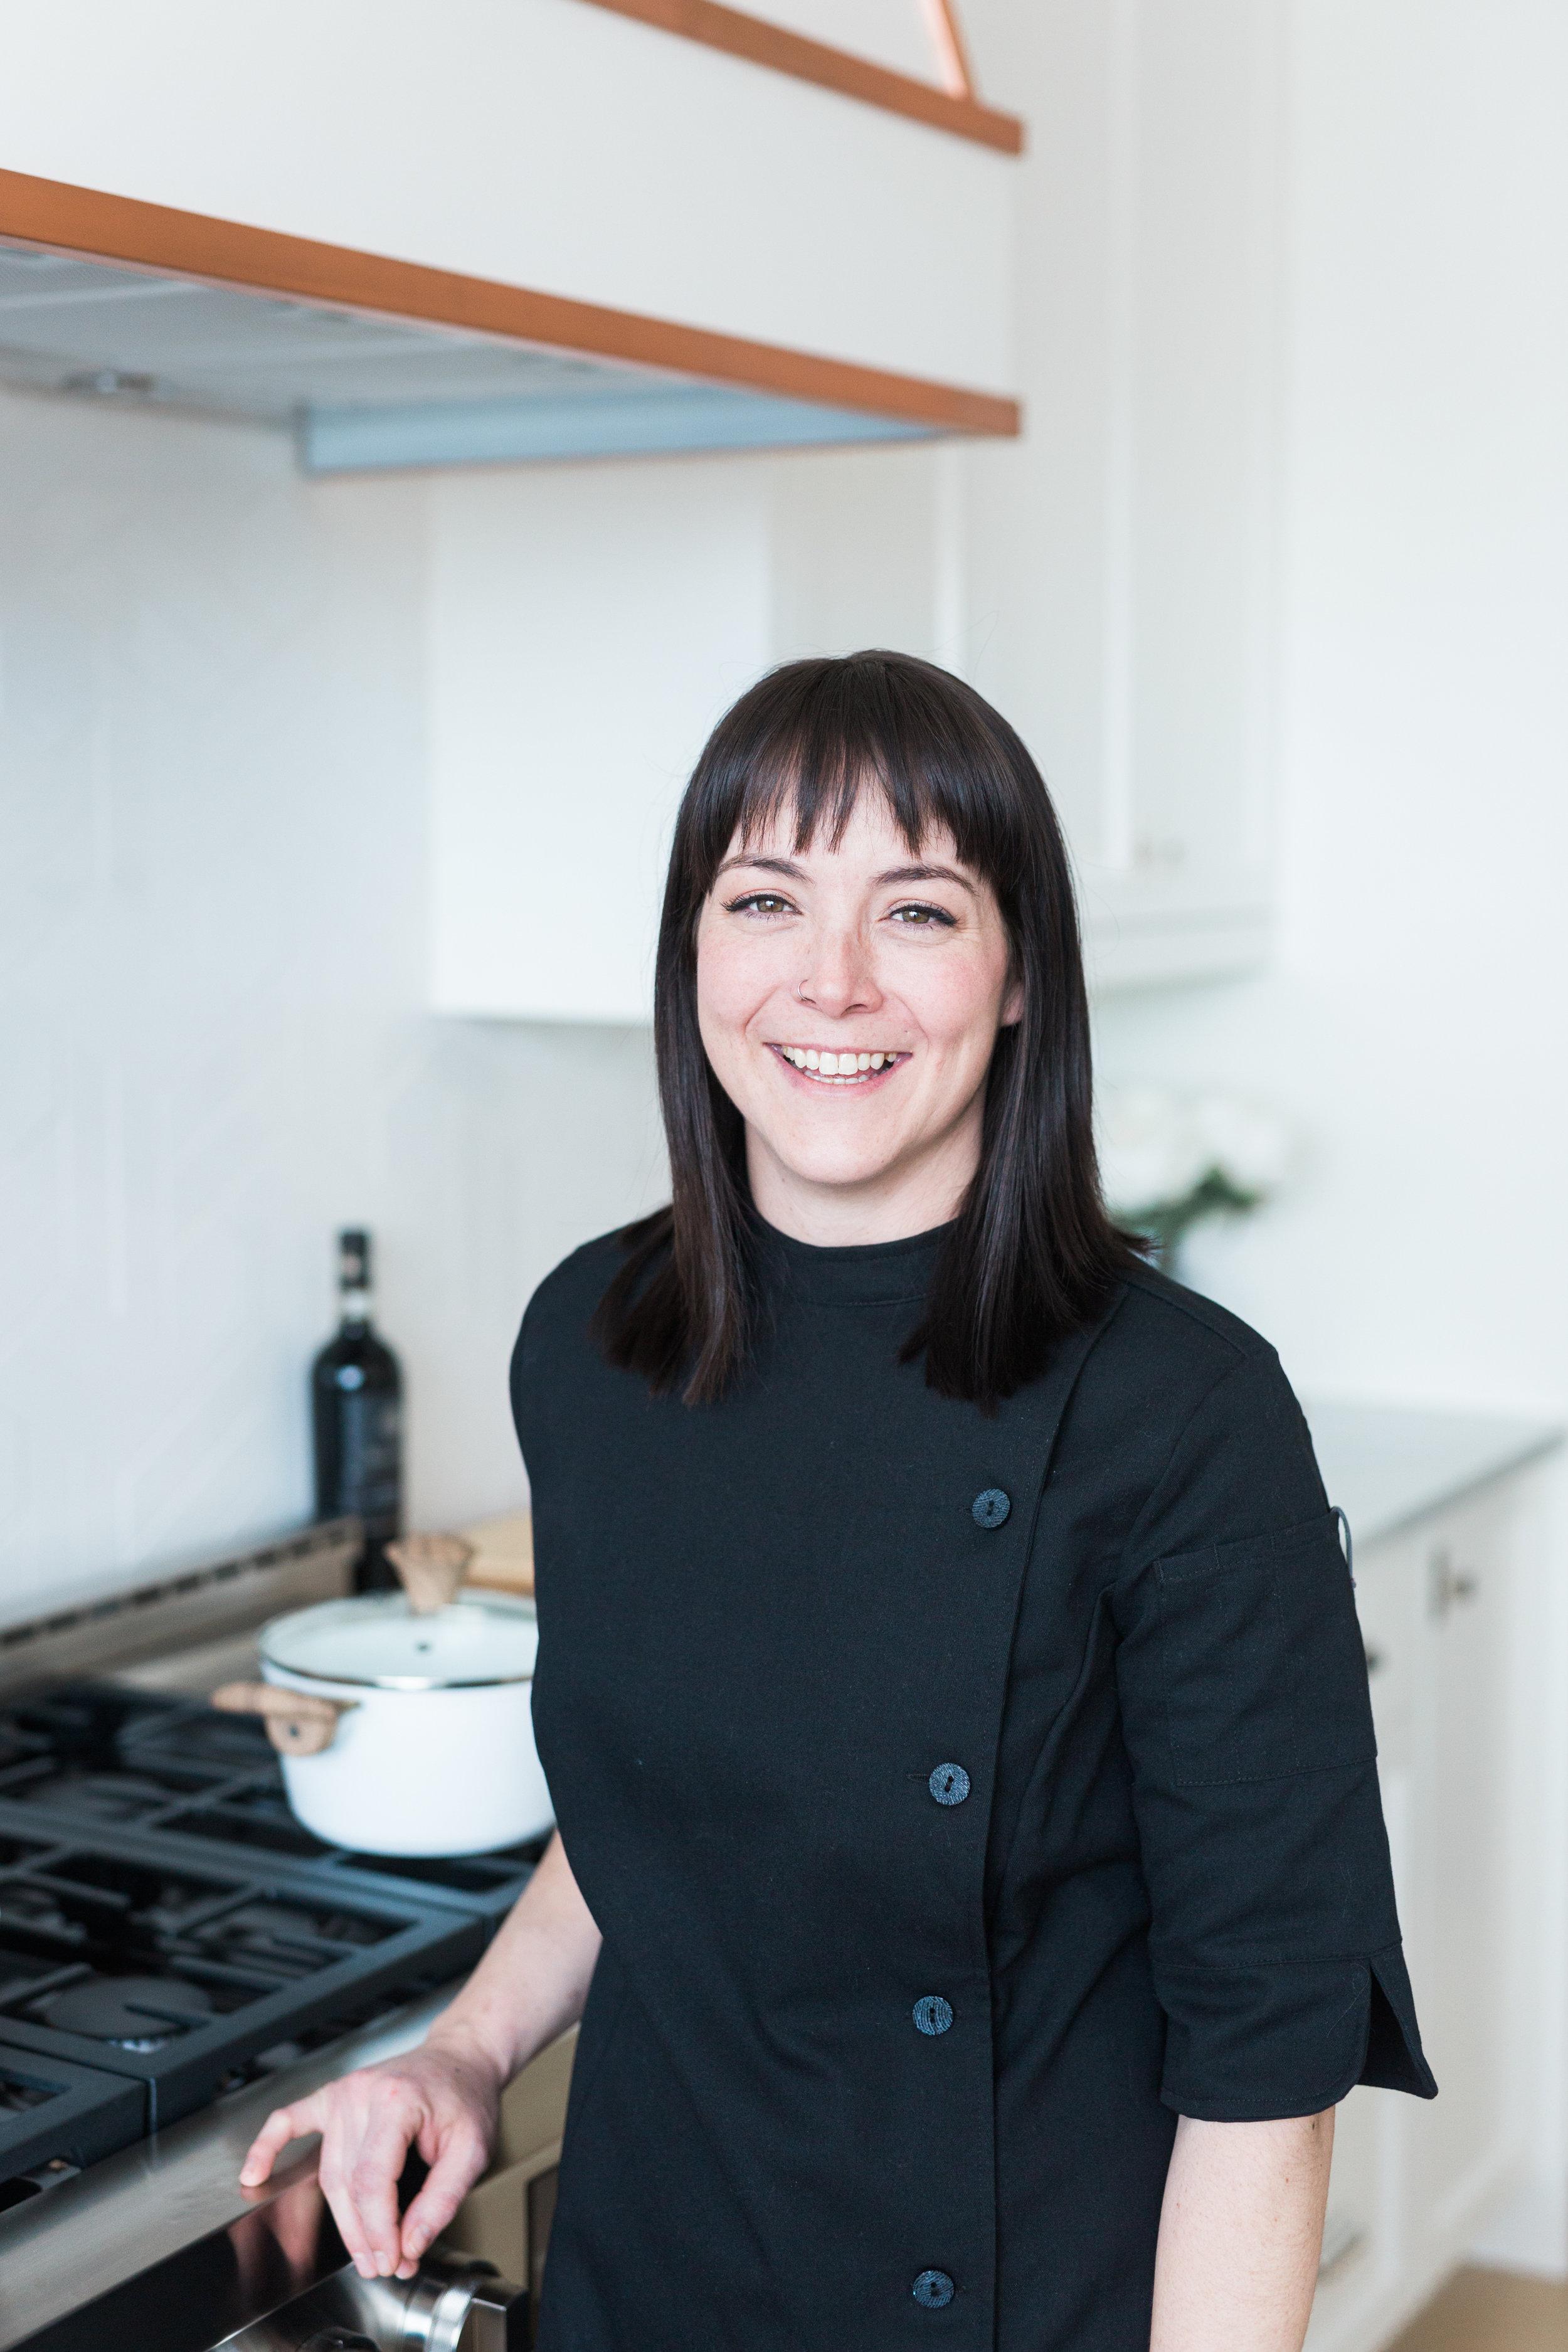 Vanessa-Rundell-Executive-Chef